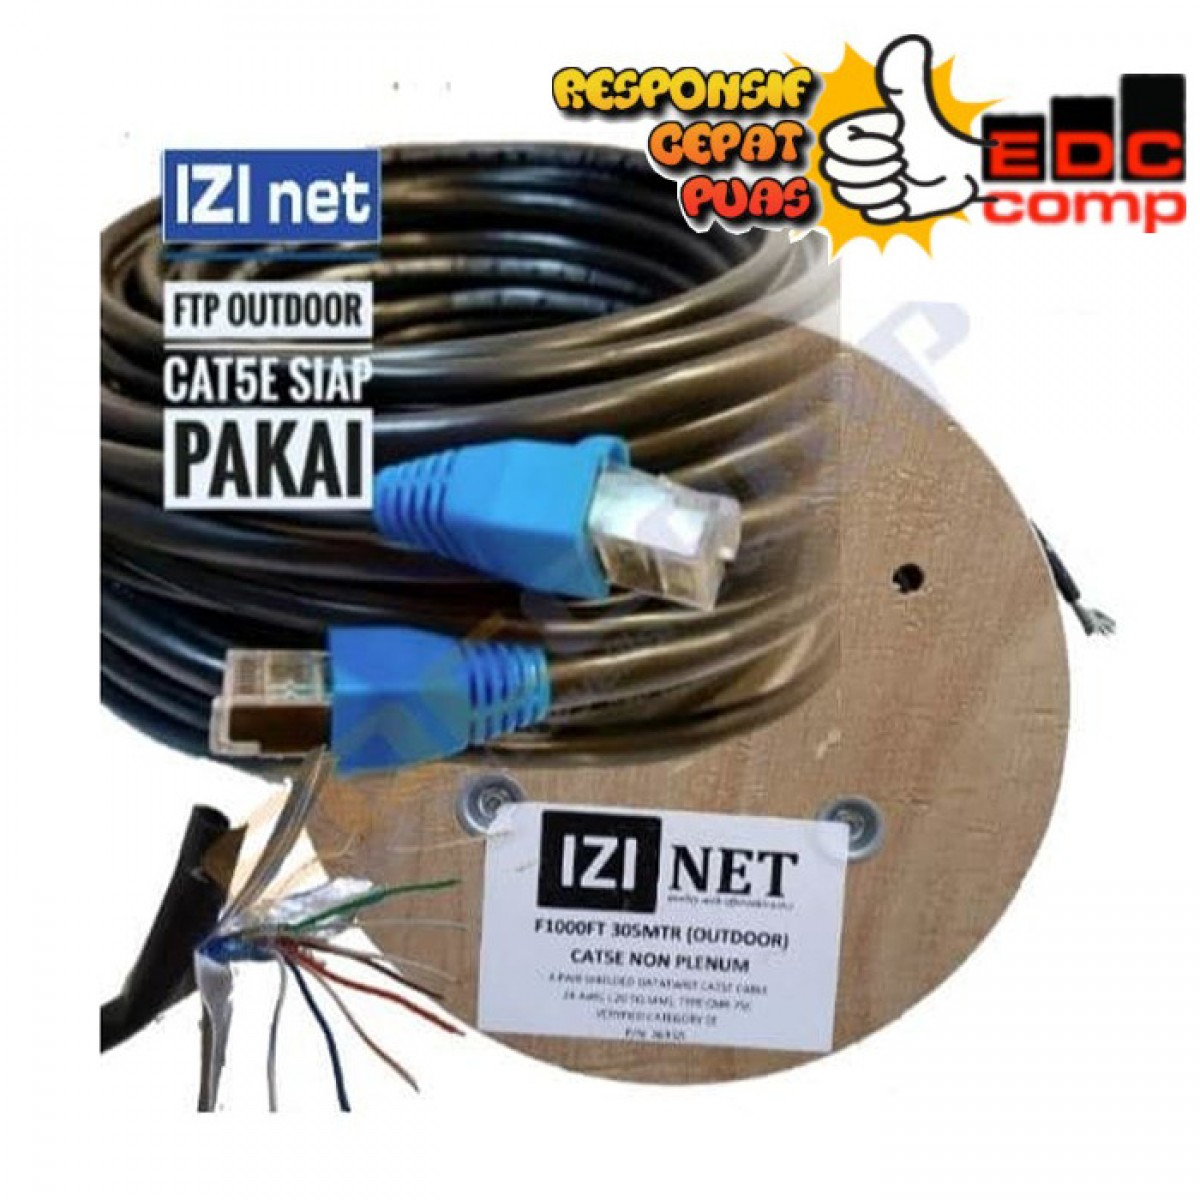 Cable STP/FTP Cat 5e Outdoor Cable 40 Meter IZI net Original - EdcComp